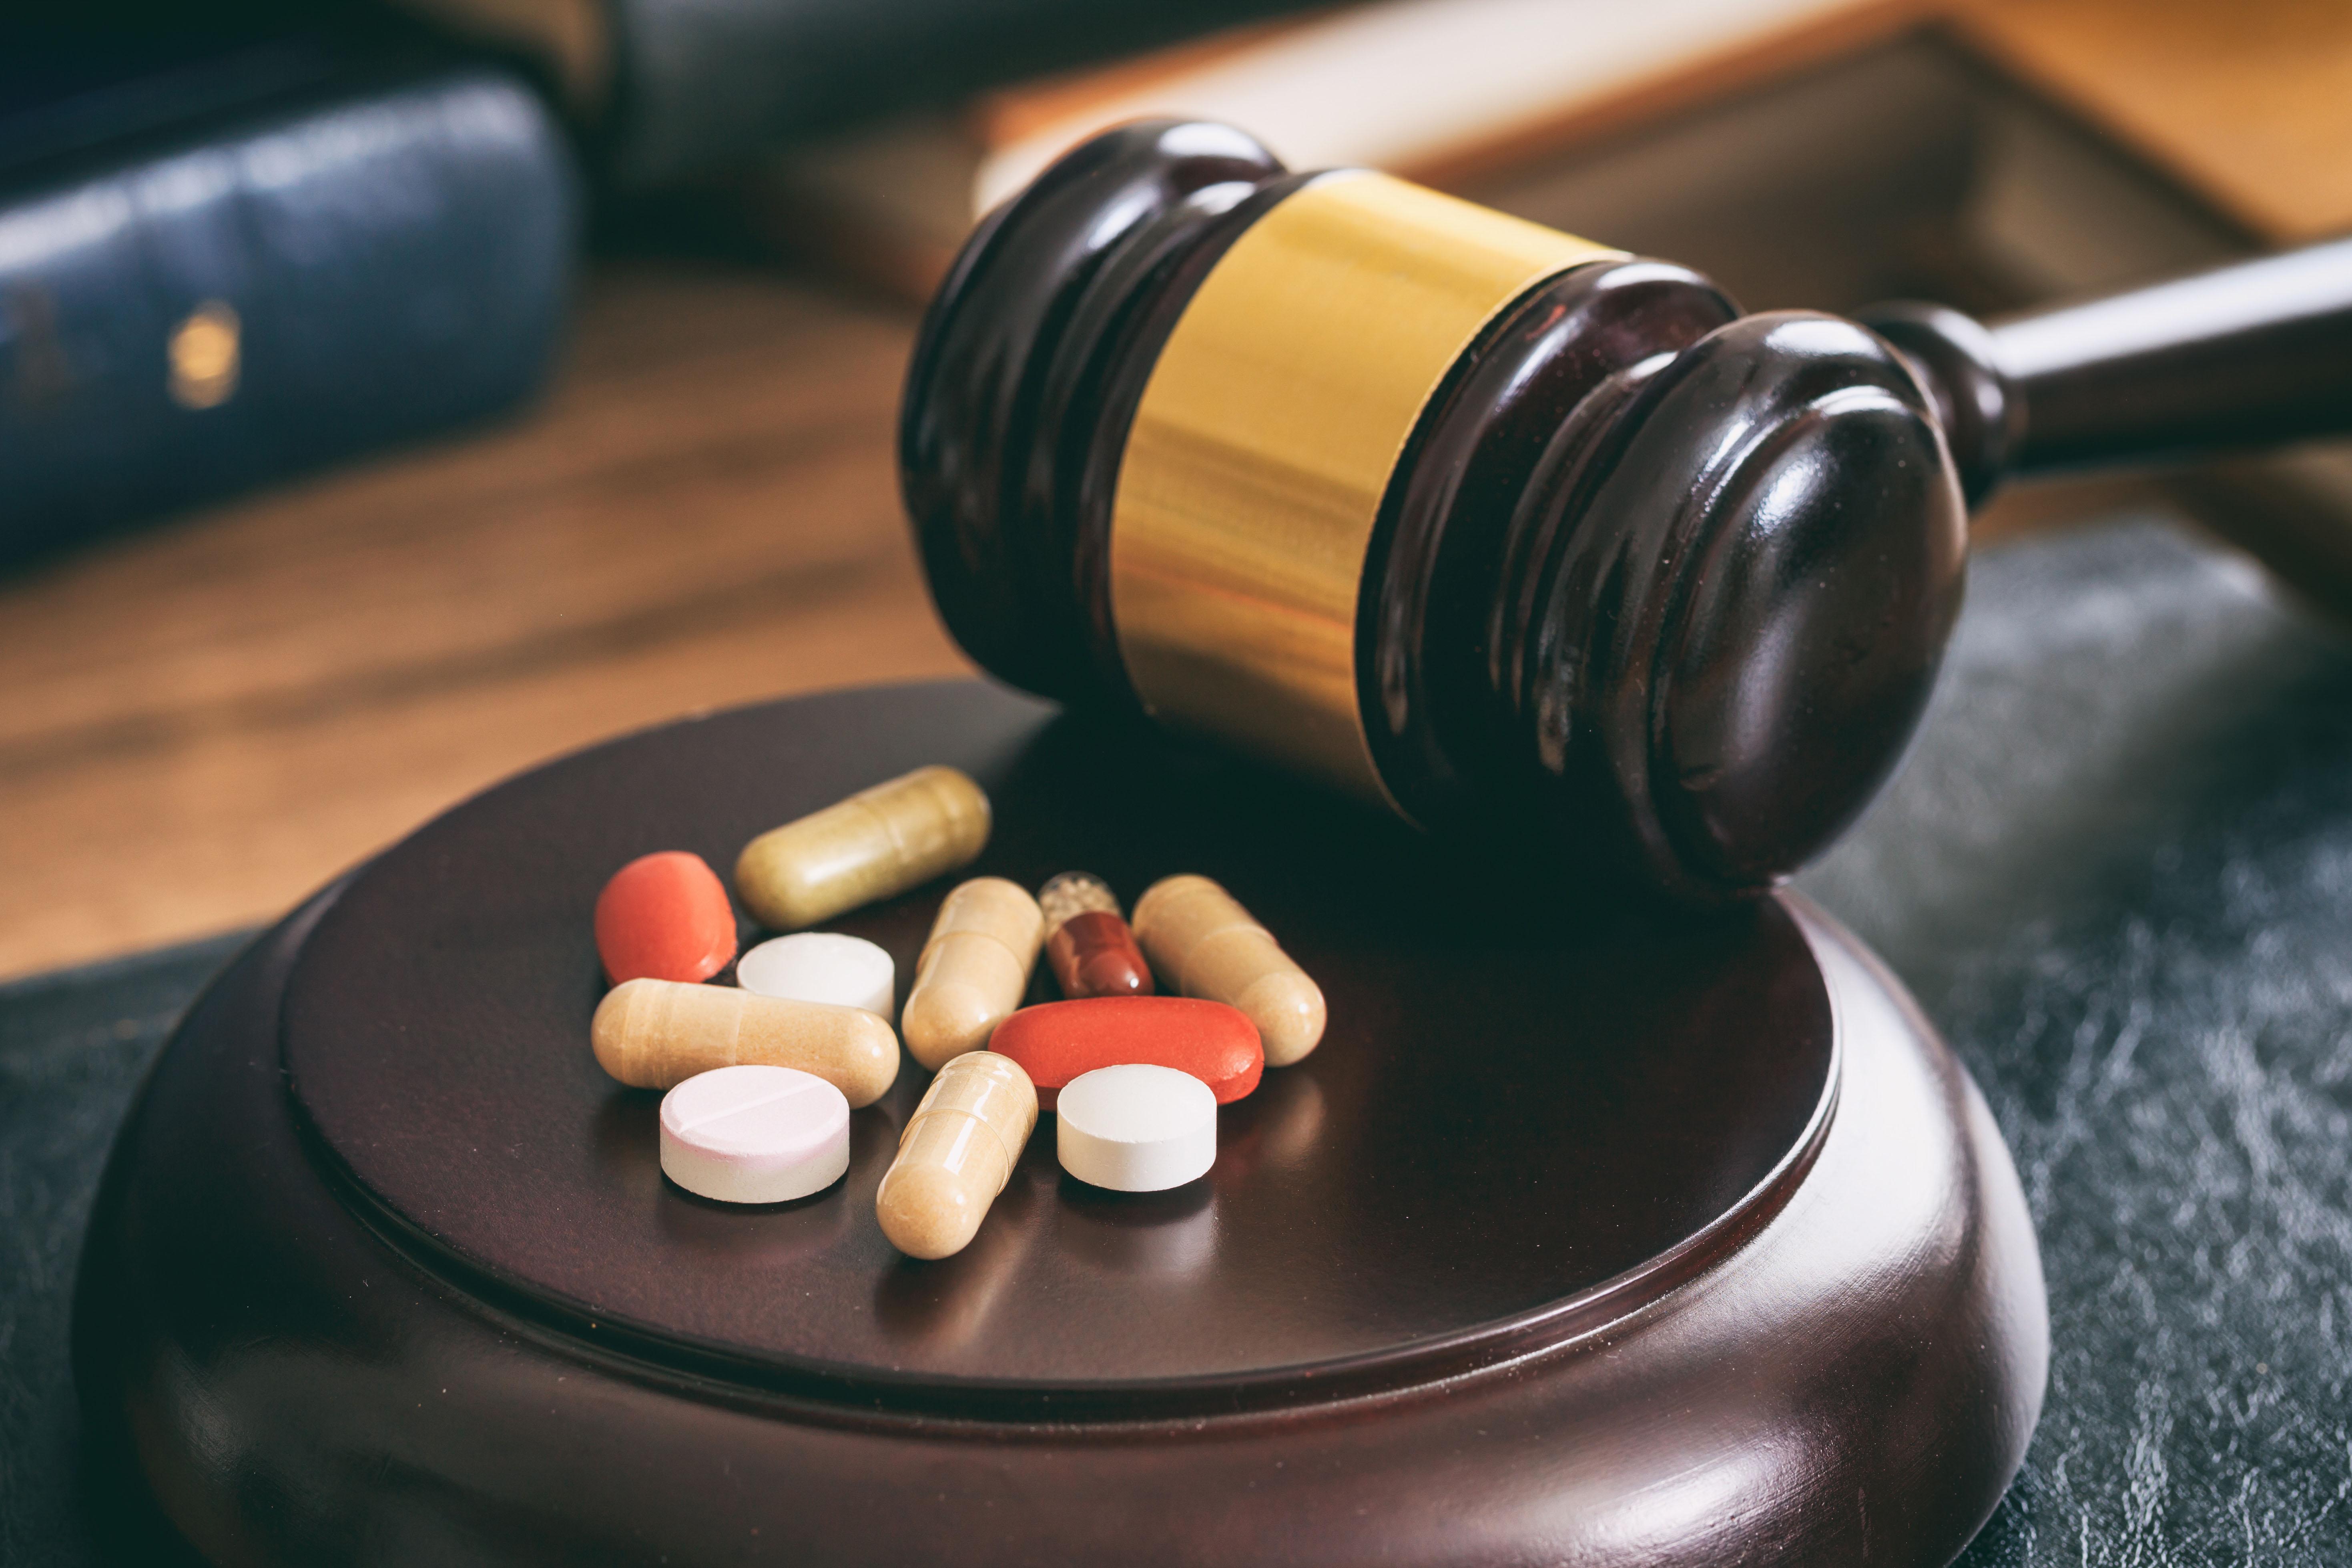 Opioid Litigation Flouts Democratic Process